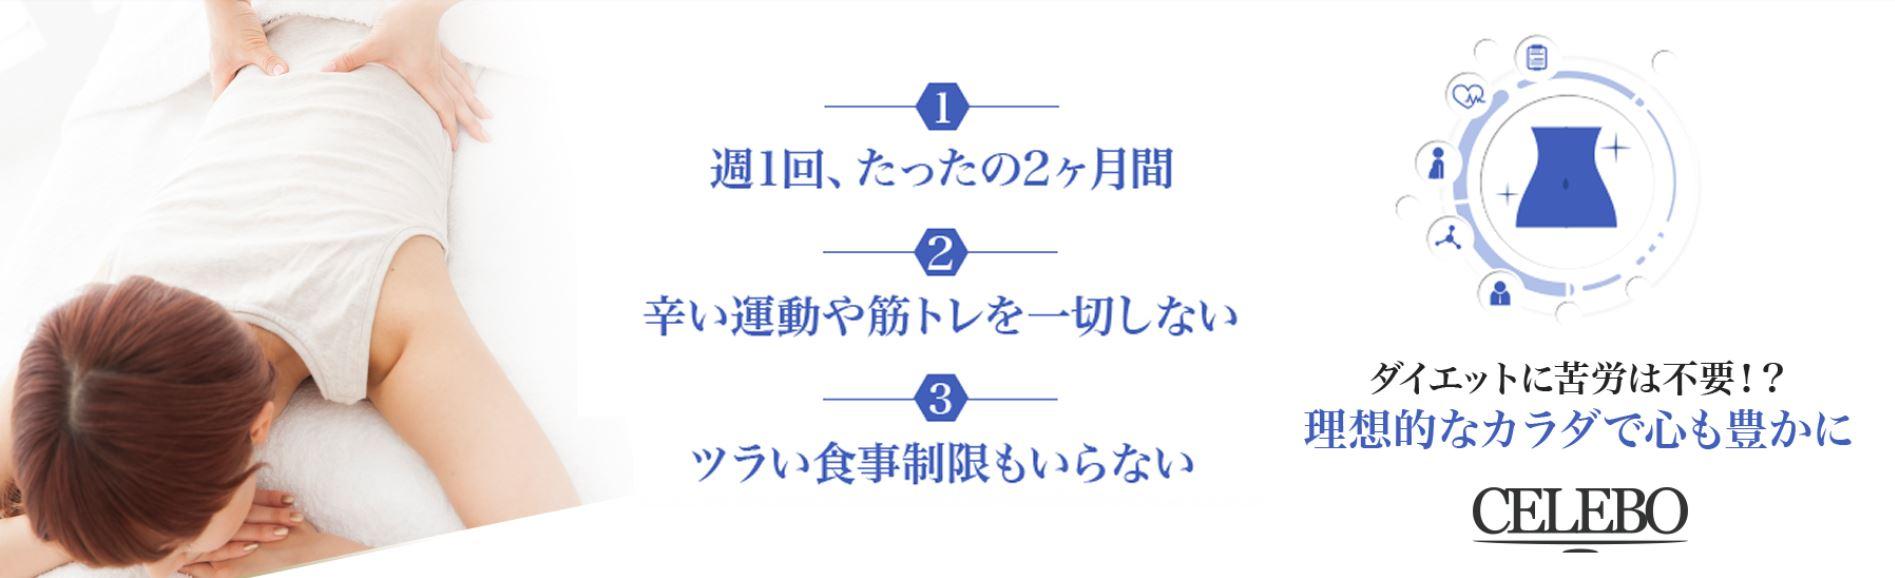 3.CELEBO(セレボ)